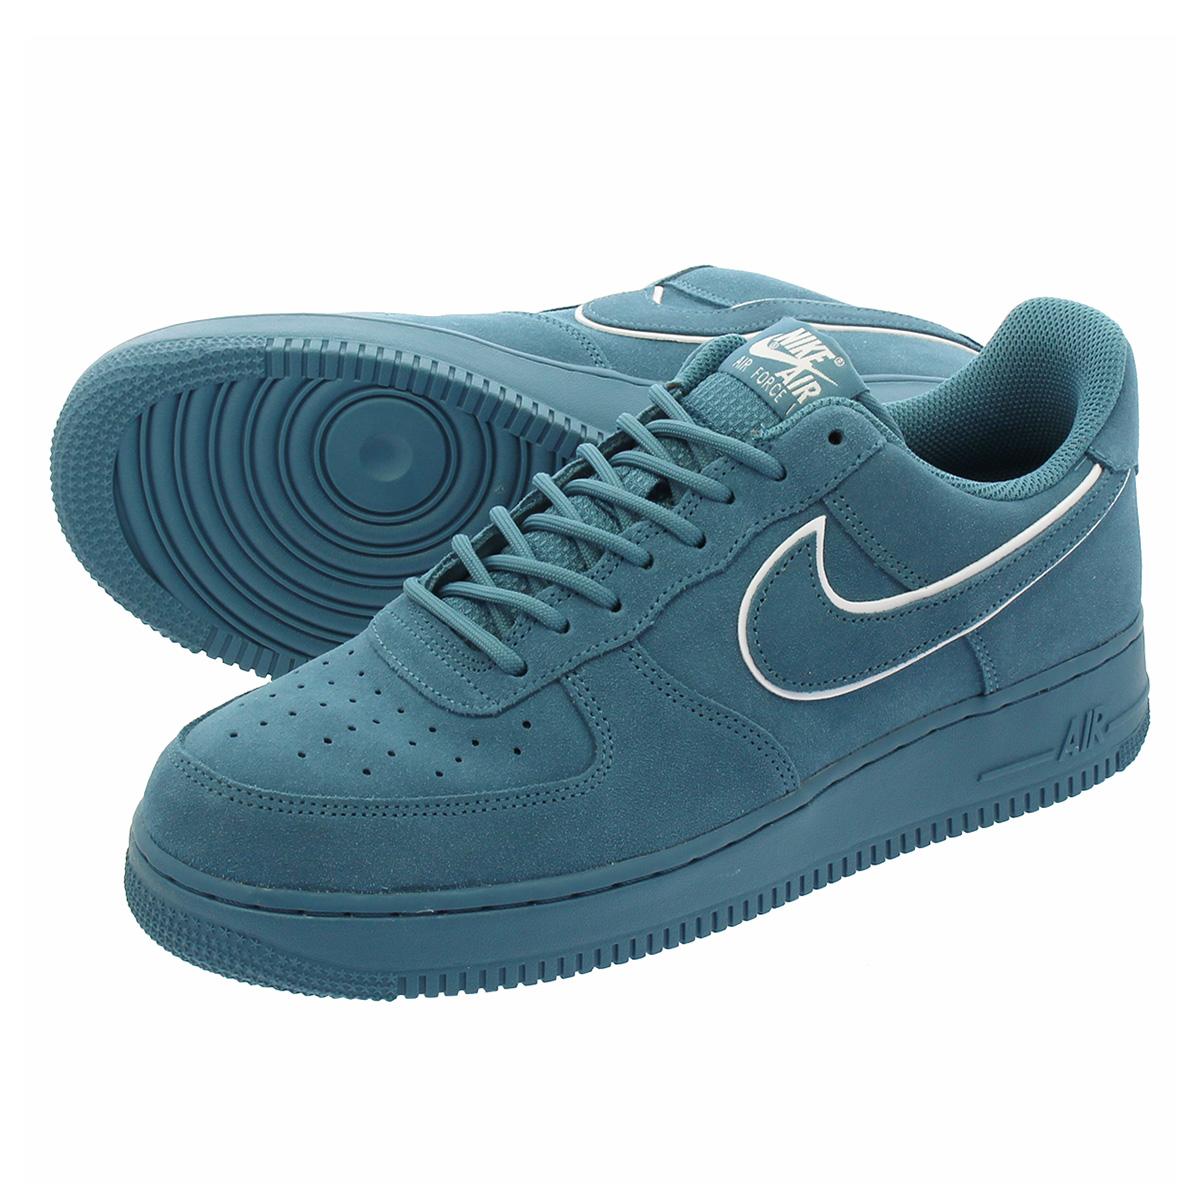 0173c8a985dd2 LOWTEX PLUS  NIKE AIR FORCE 1  07 LV8 SUEDE Nike air force 1  07 LV8 suede  NOISE AQUA BLUE FORCE